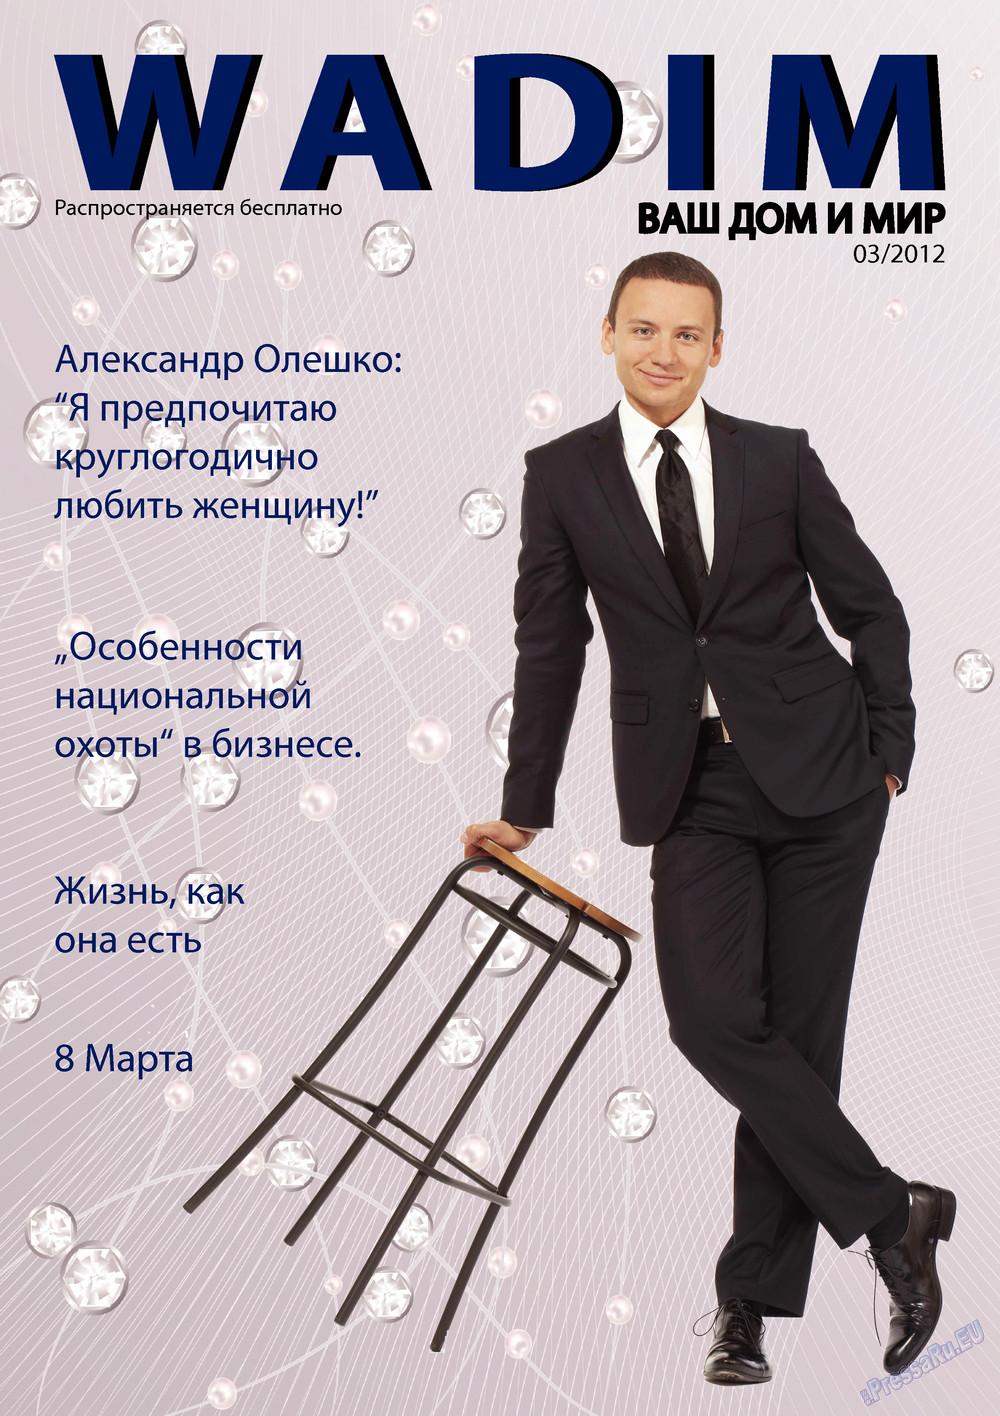 Wadim (журнал). 2012 год, номер 3, стр. 1